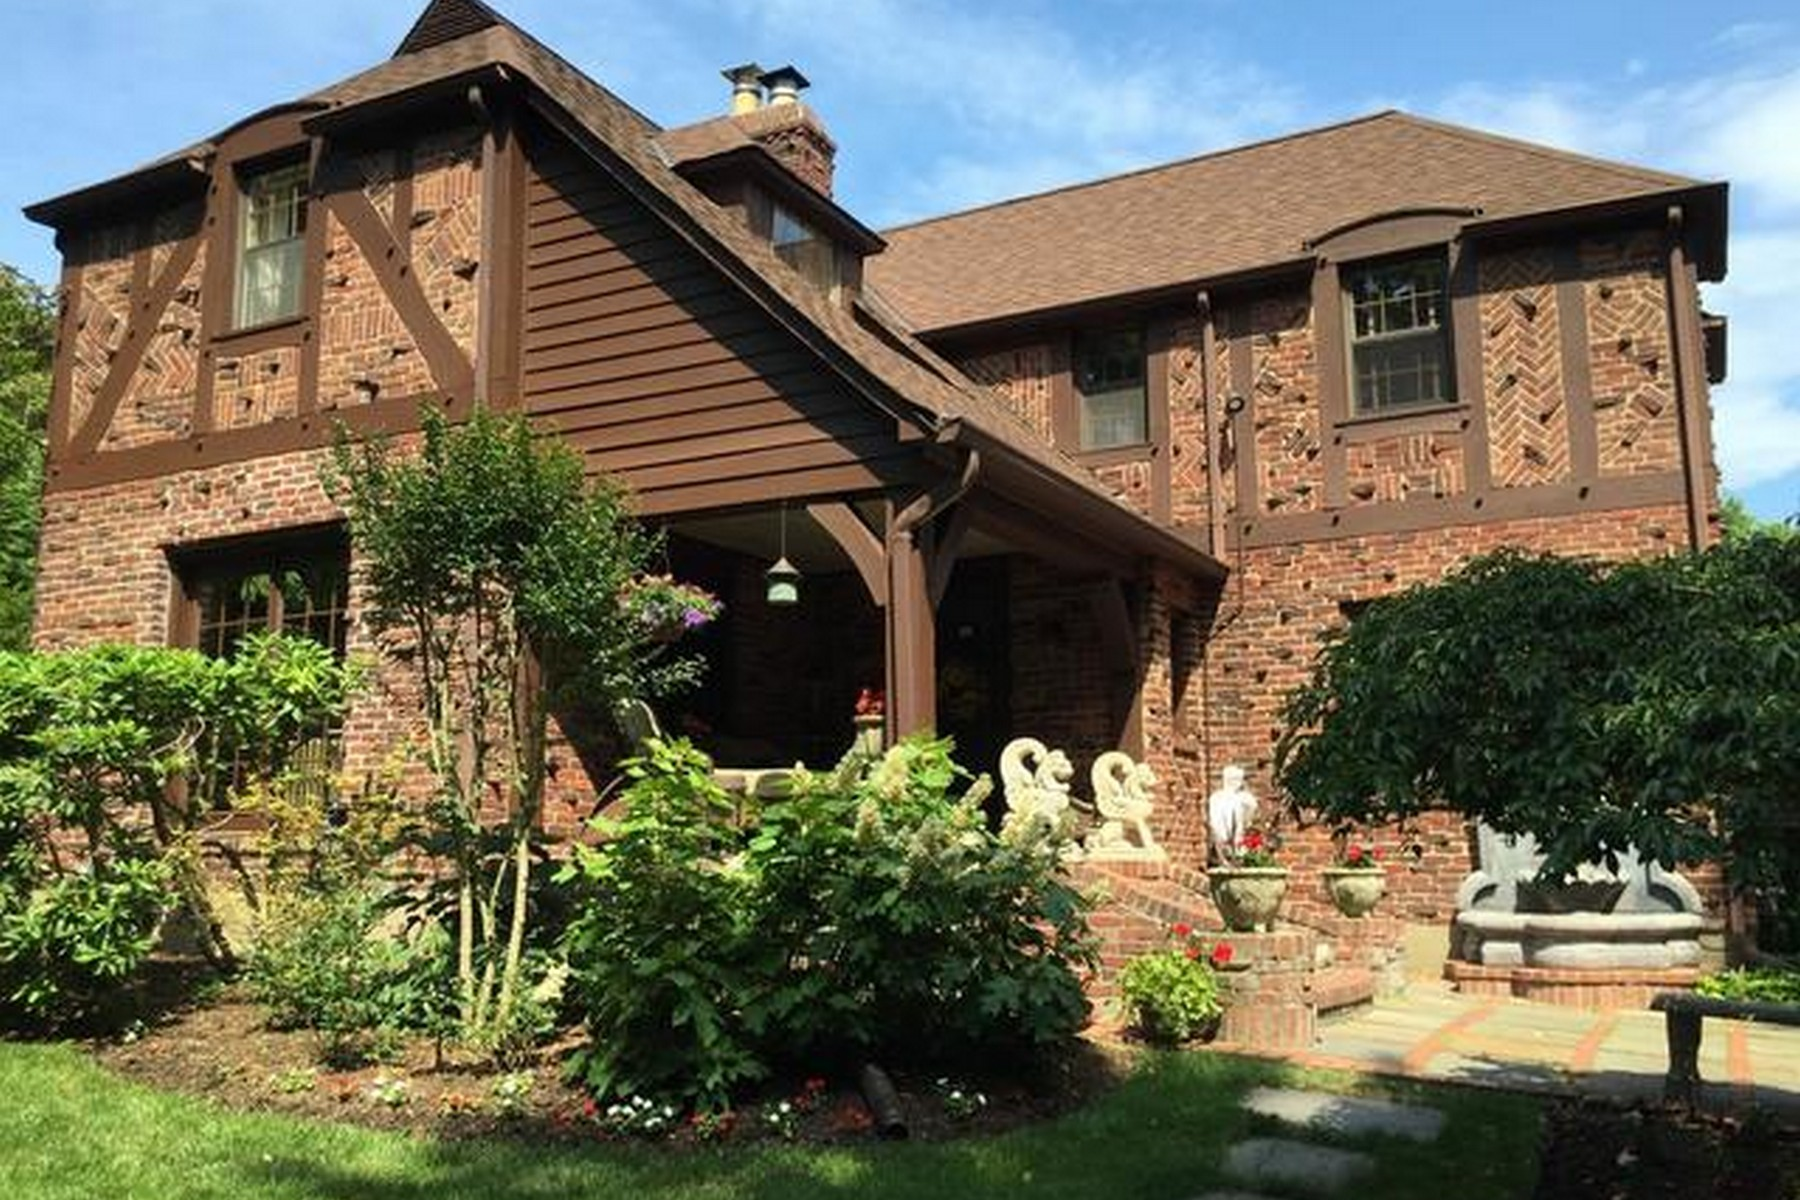 Single Family Homes for Active at Huntington Bay 312 Bay Ave Huntington Bay, New York 11743 United States